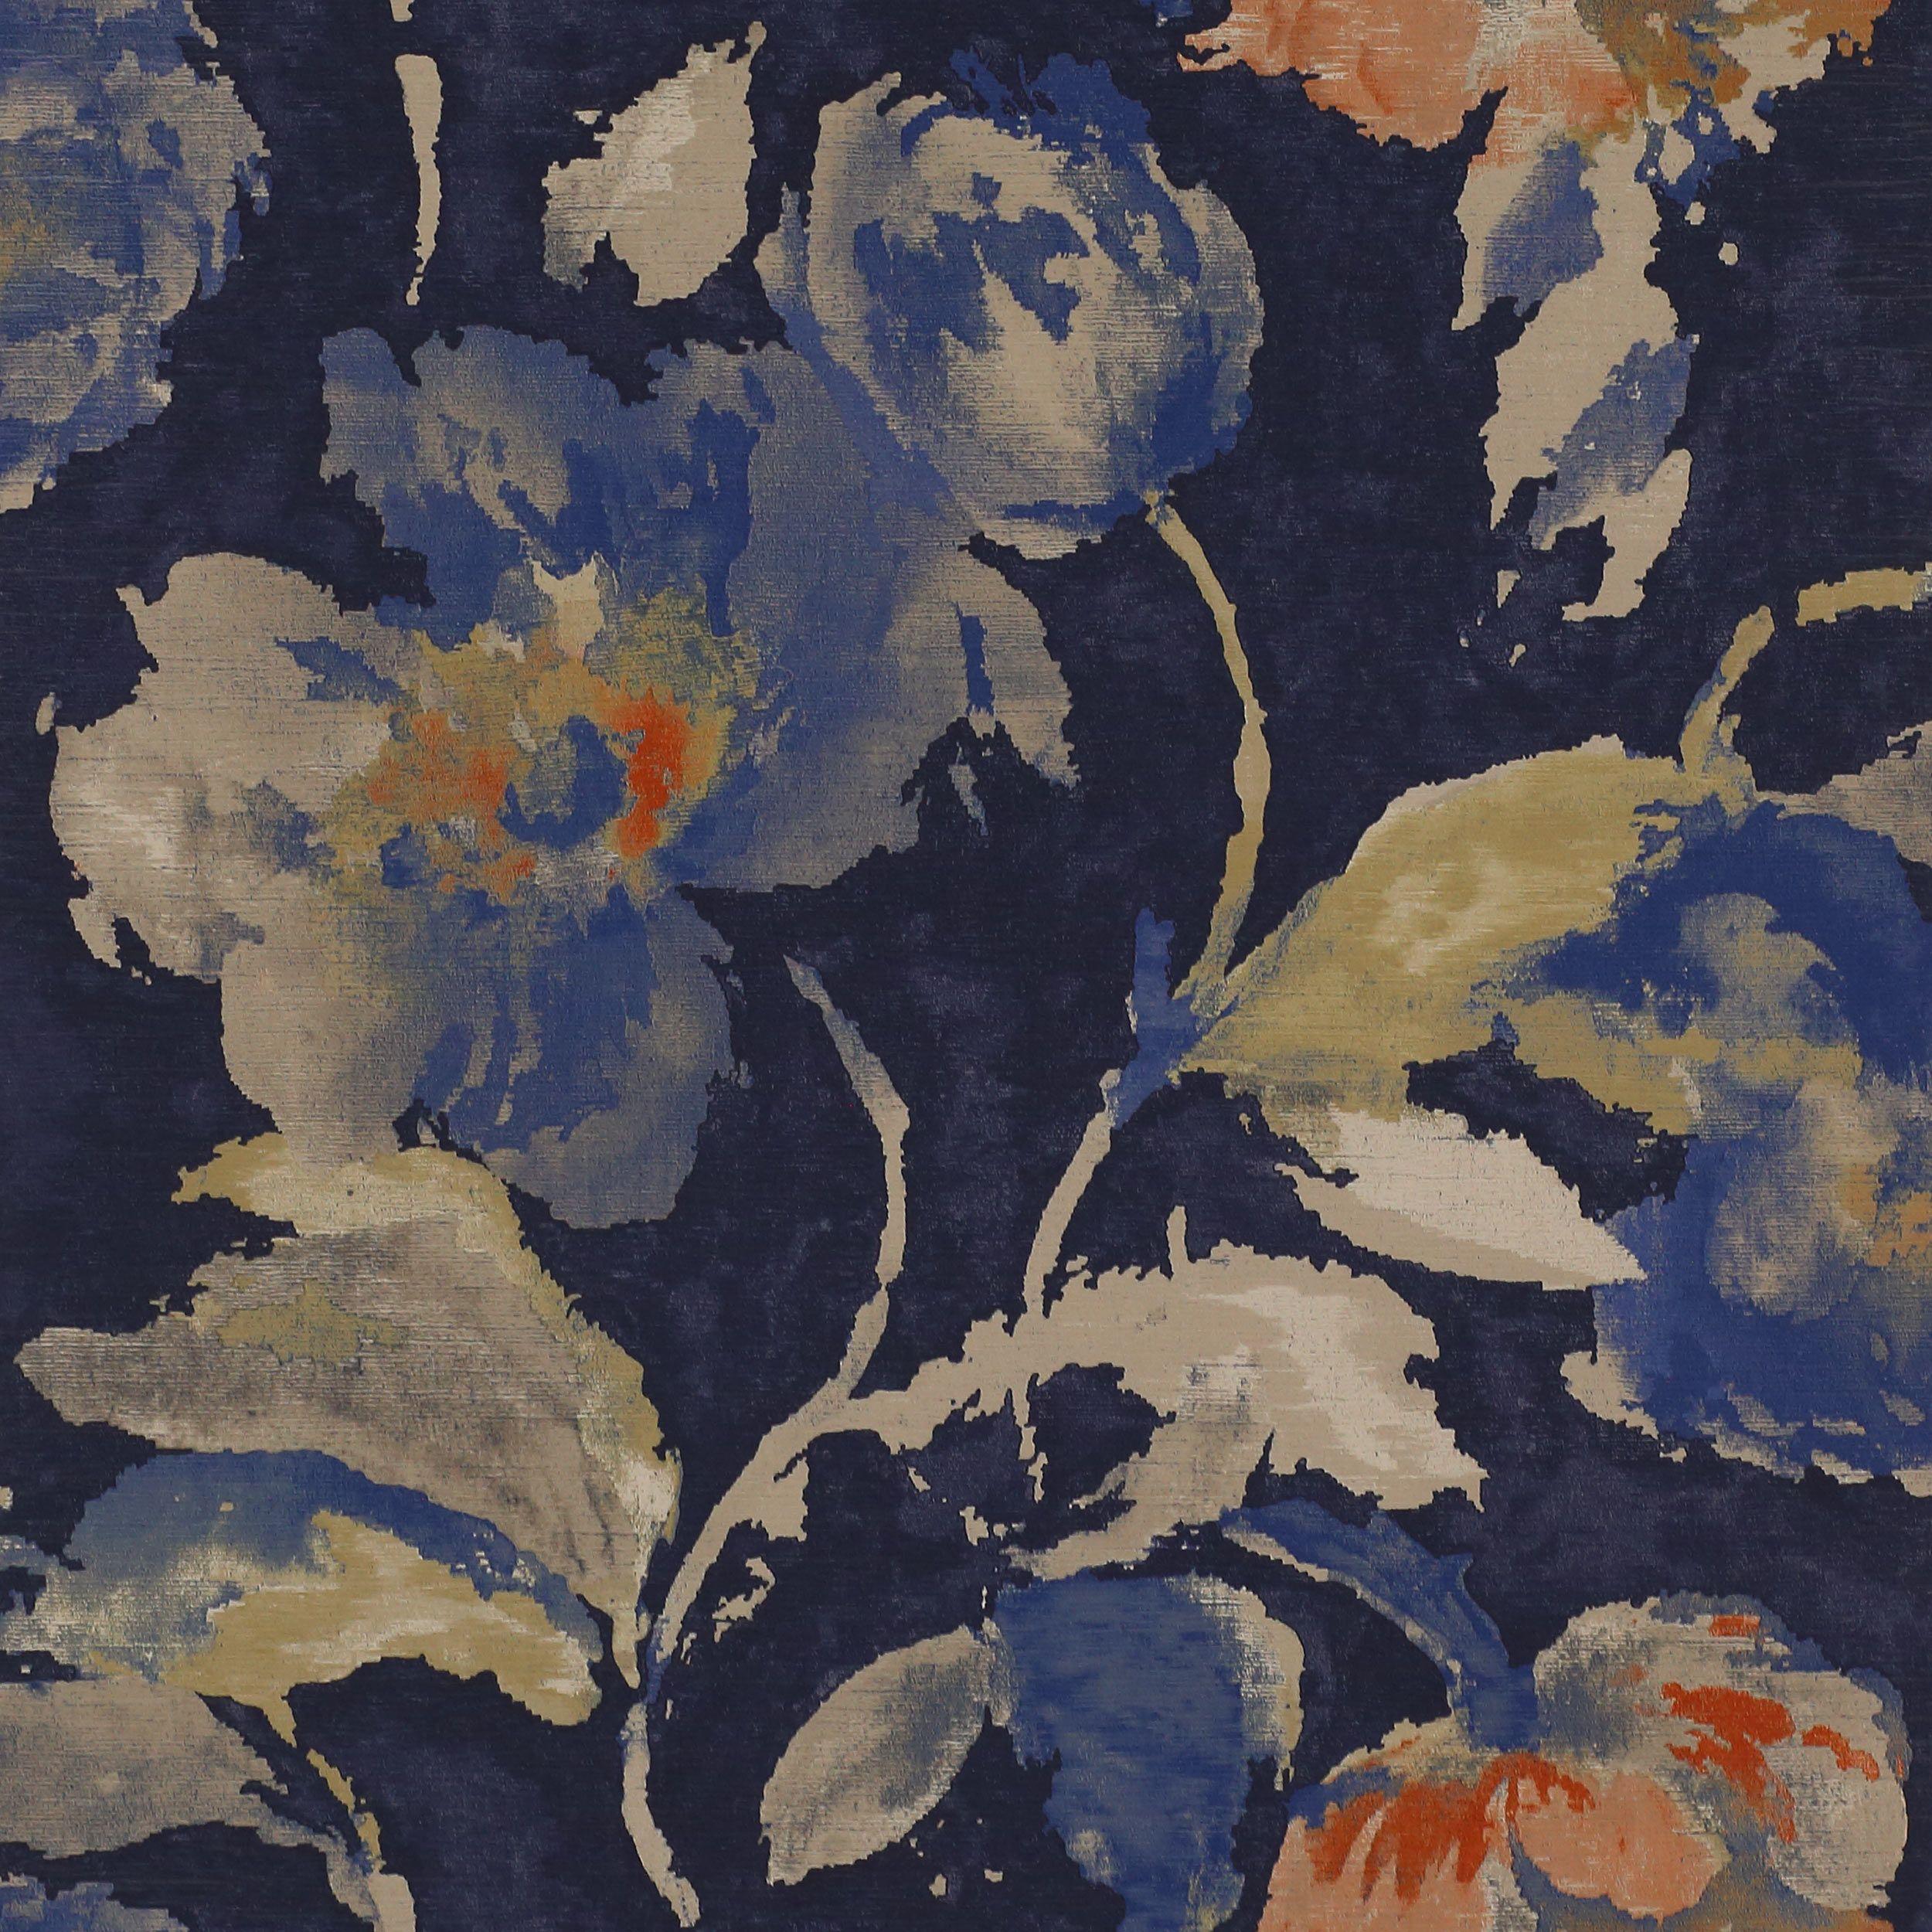 Beatrice Wallpaper, midnight Cowtan & Tout Design